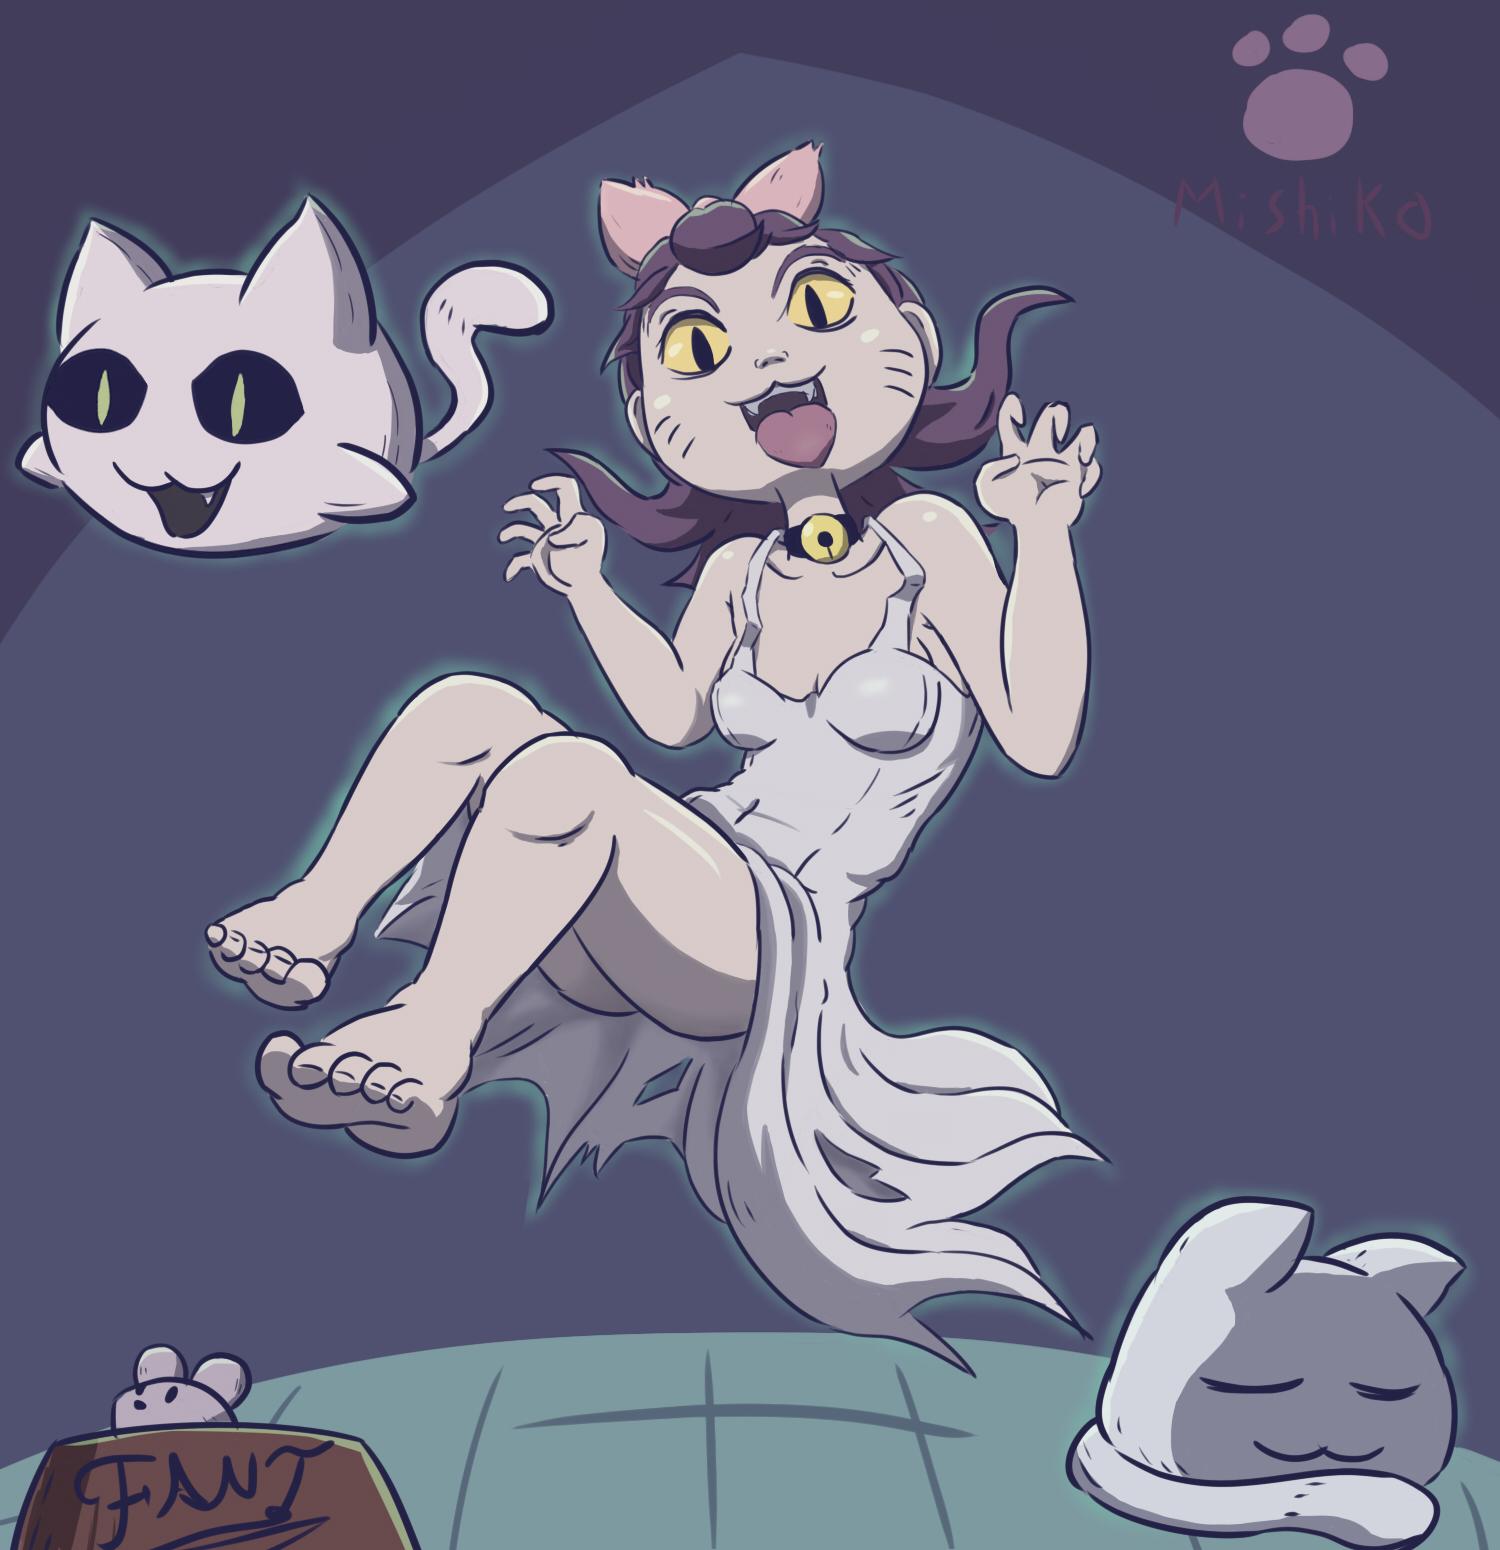 Mishiko the ghost cat